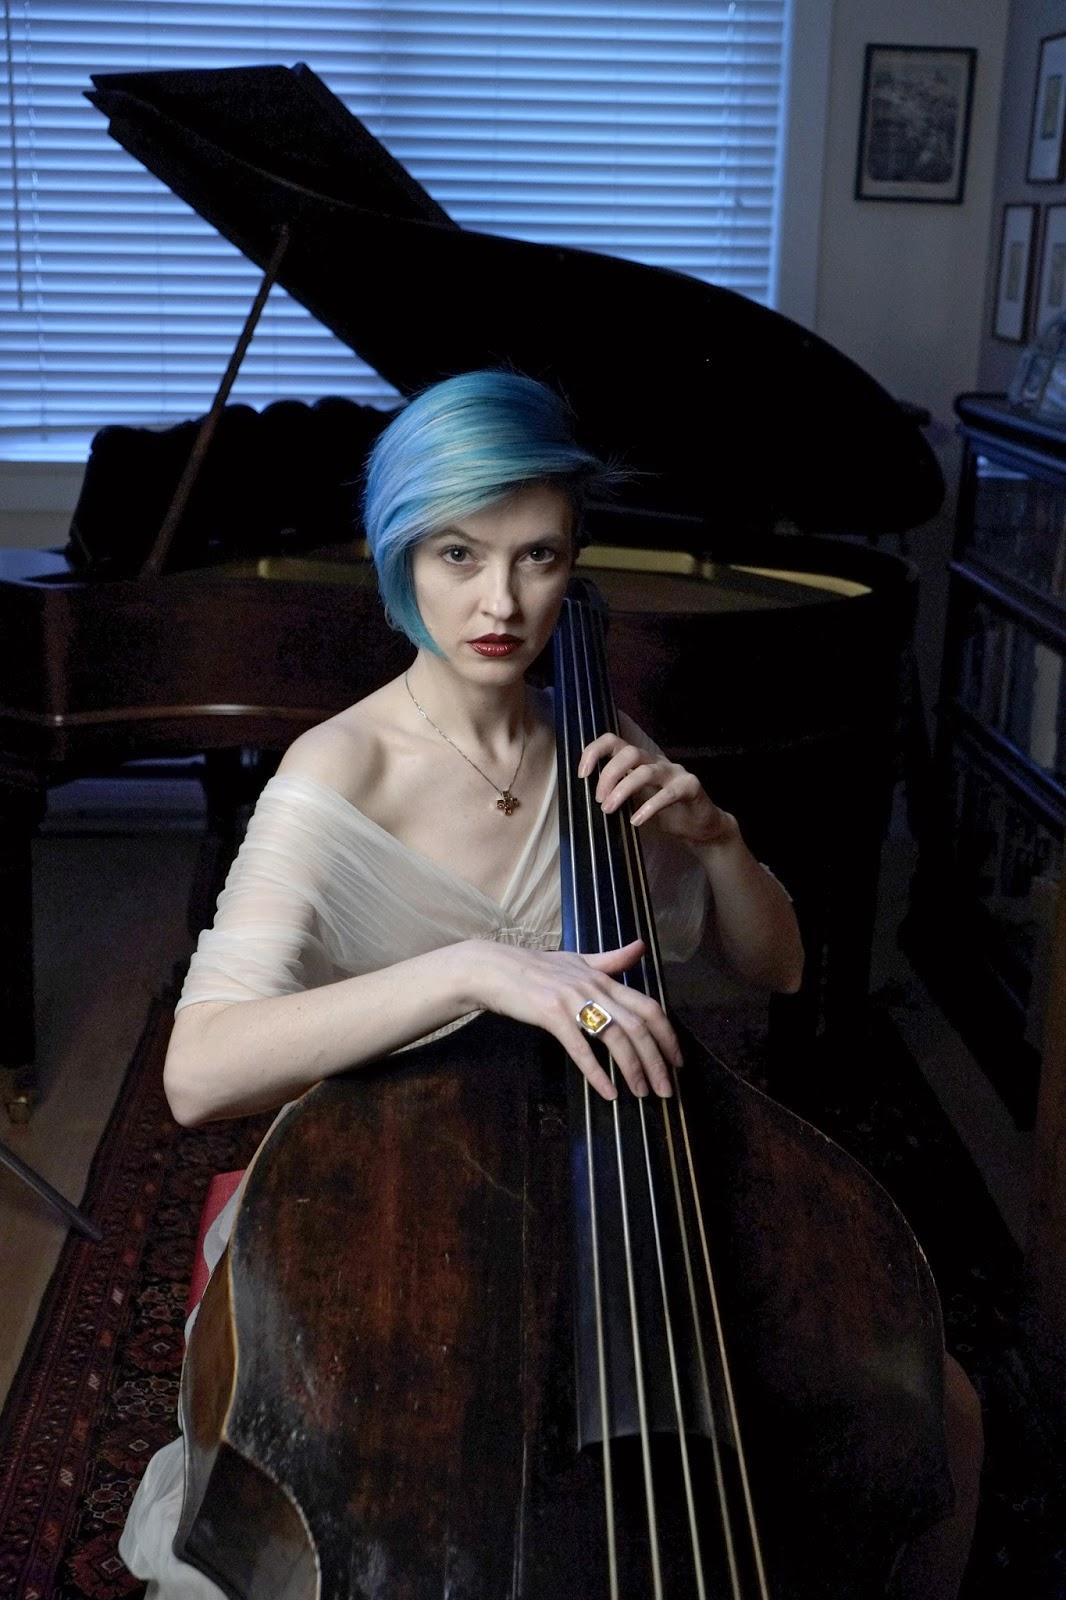 Alex Waterhouse-Hayward